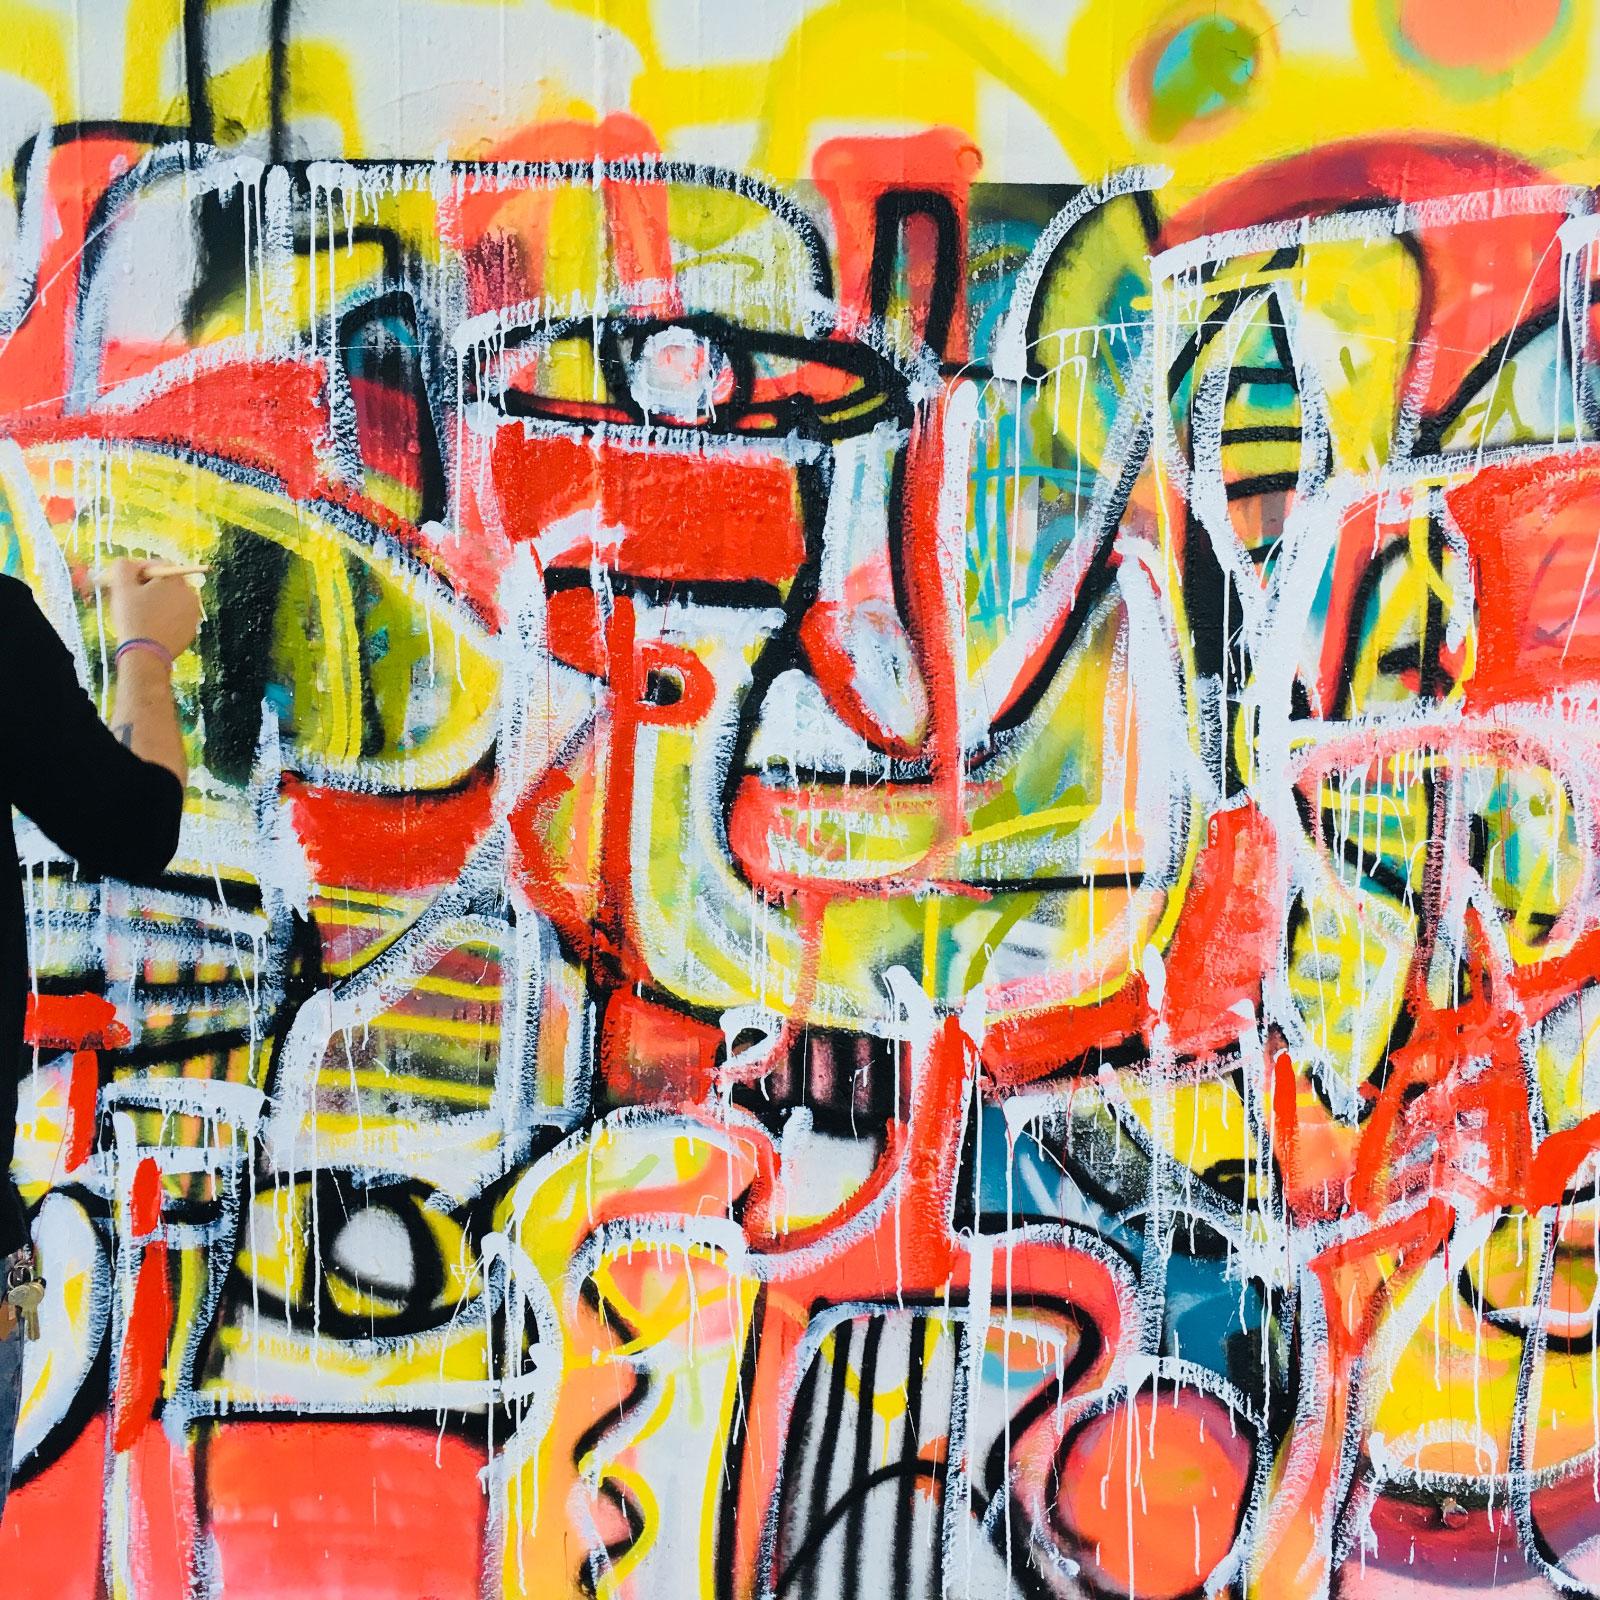 Rob_Adalierd_Painting_Vienna_Abstract_Contemporary_Street_art_1.jpg